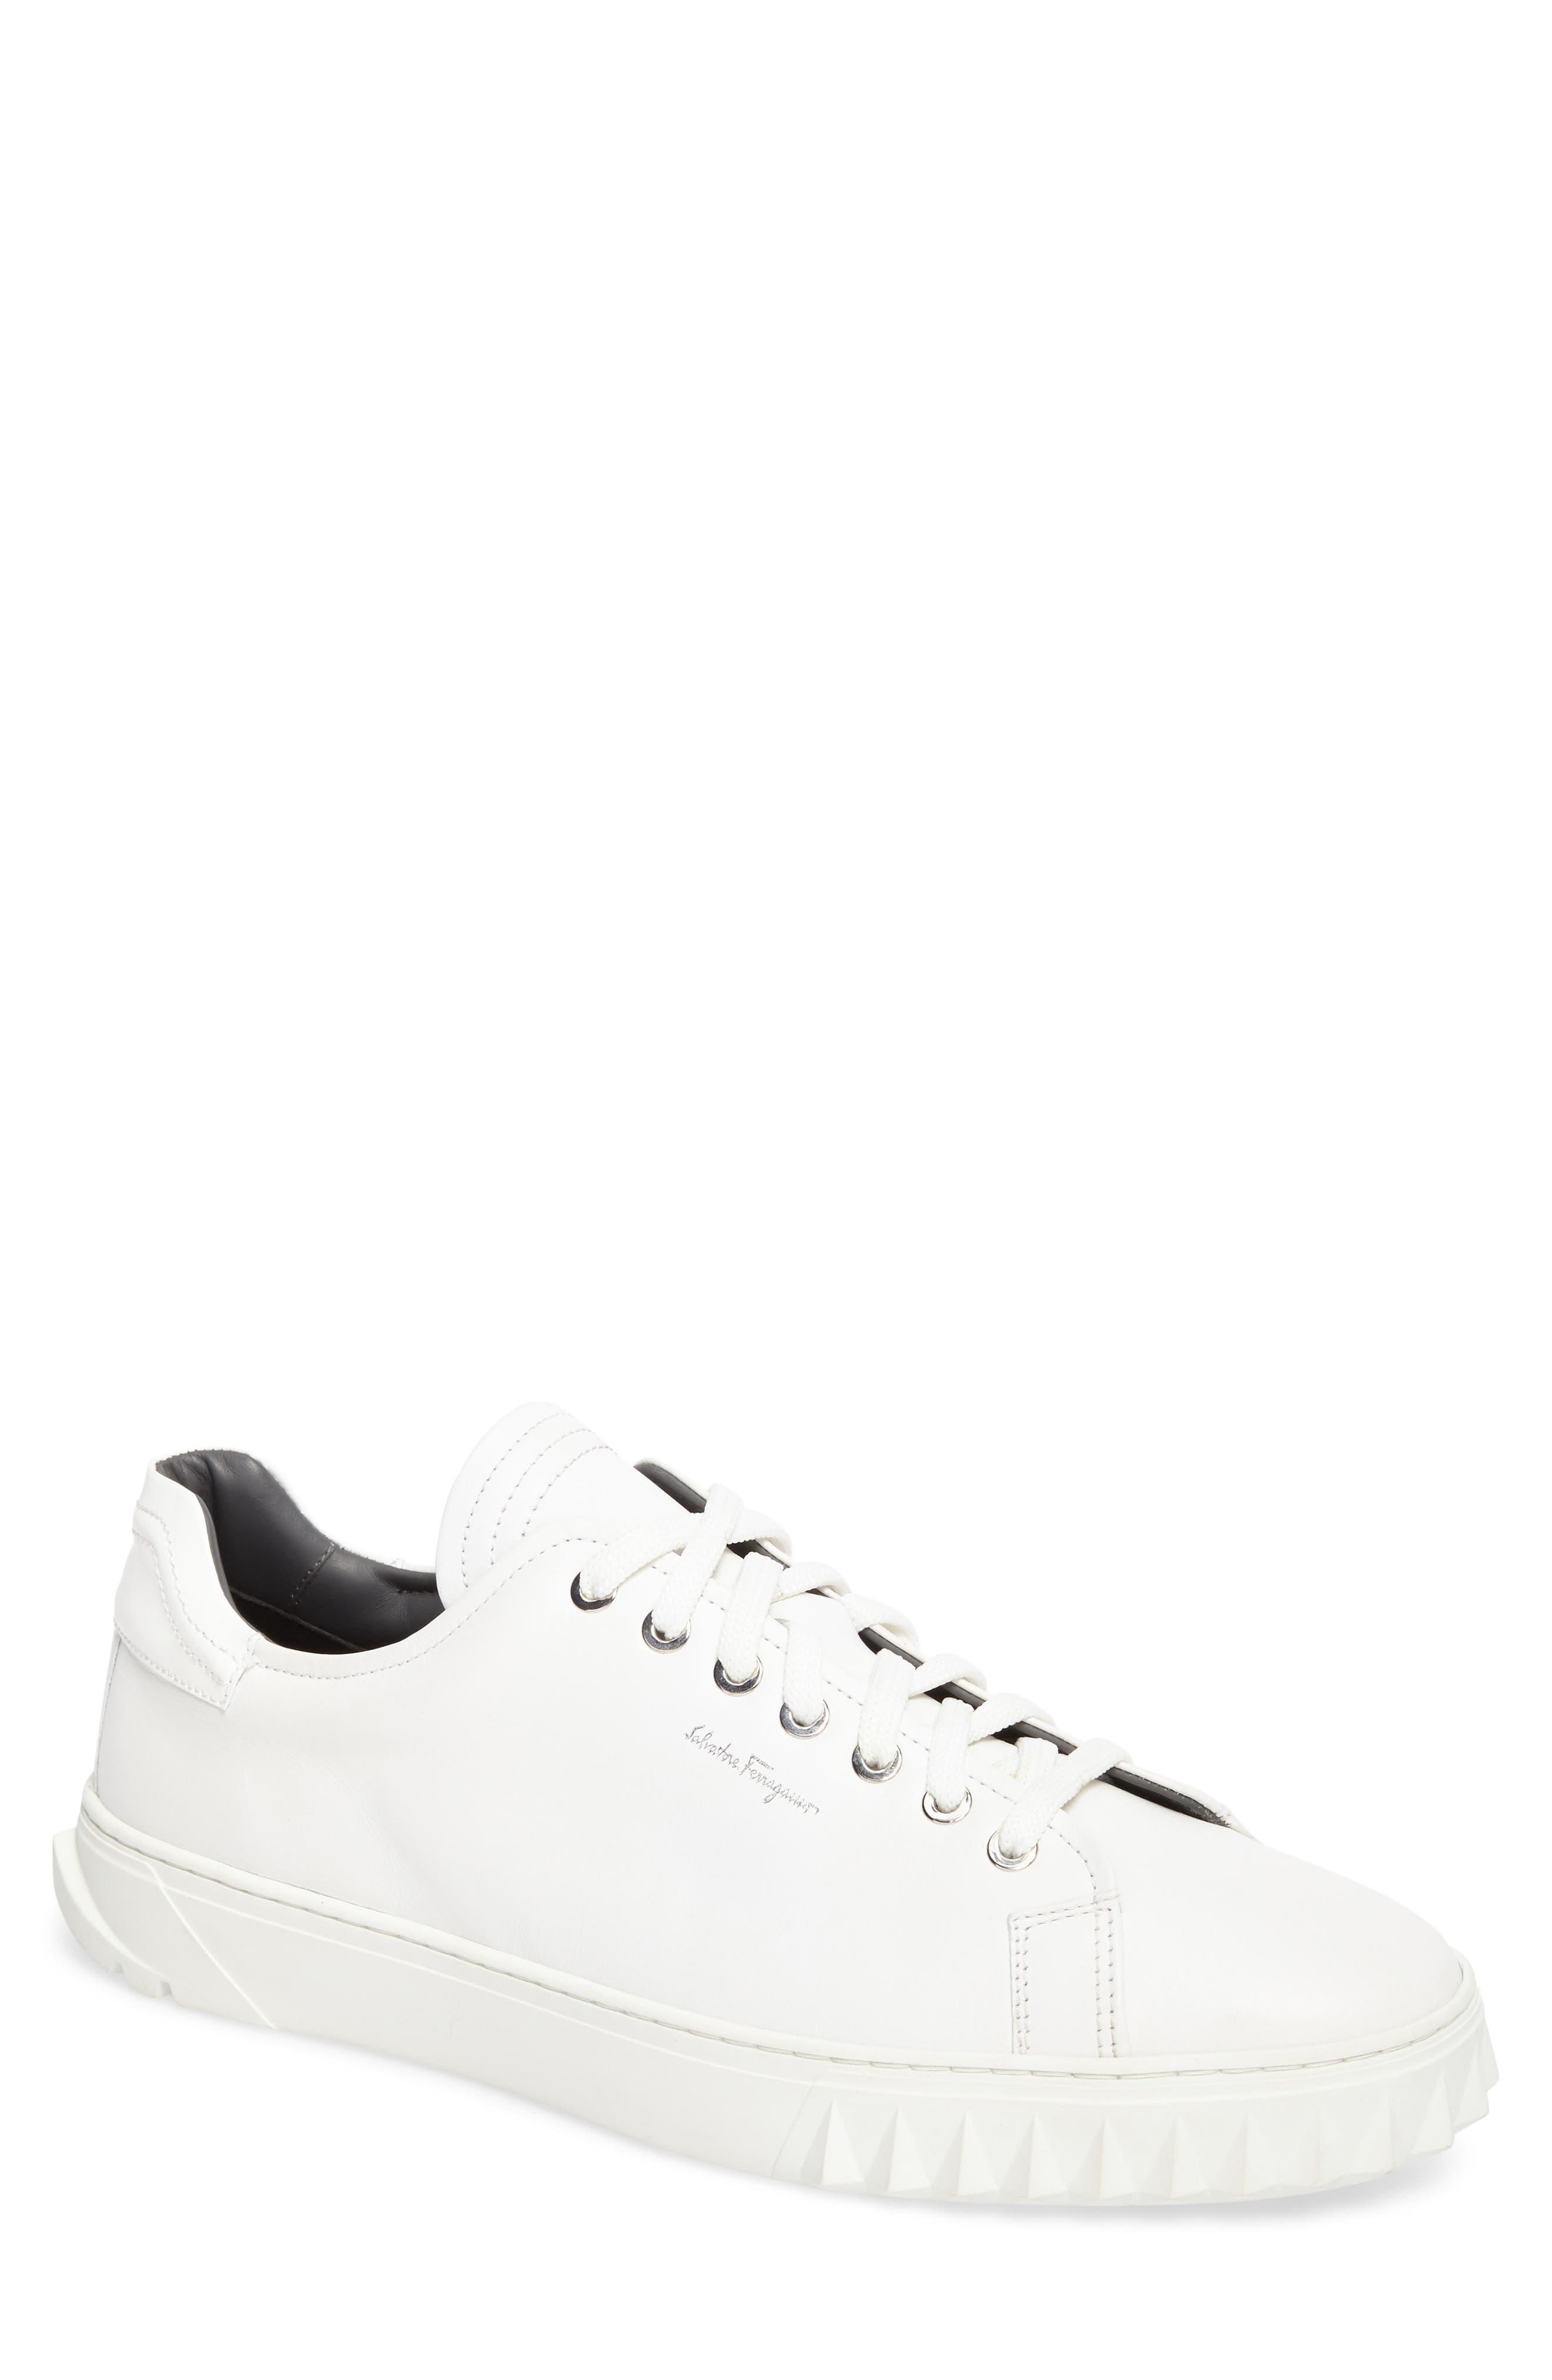 Cube Sneaker,                         Main,                         color, Bianco